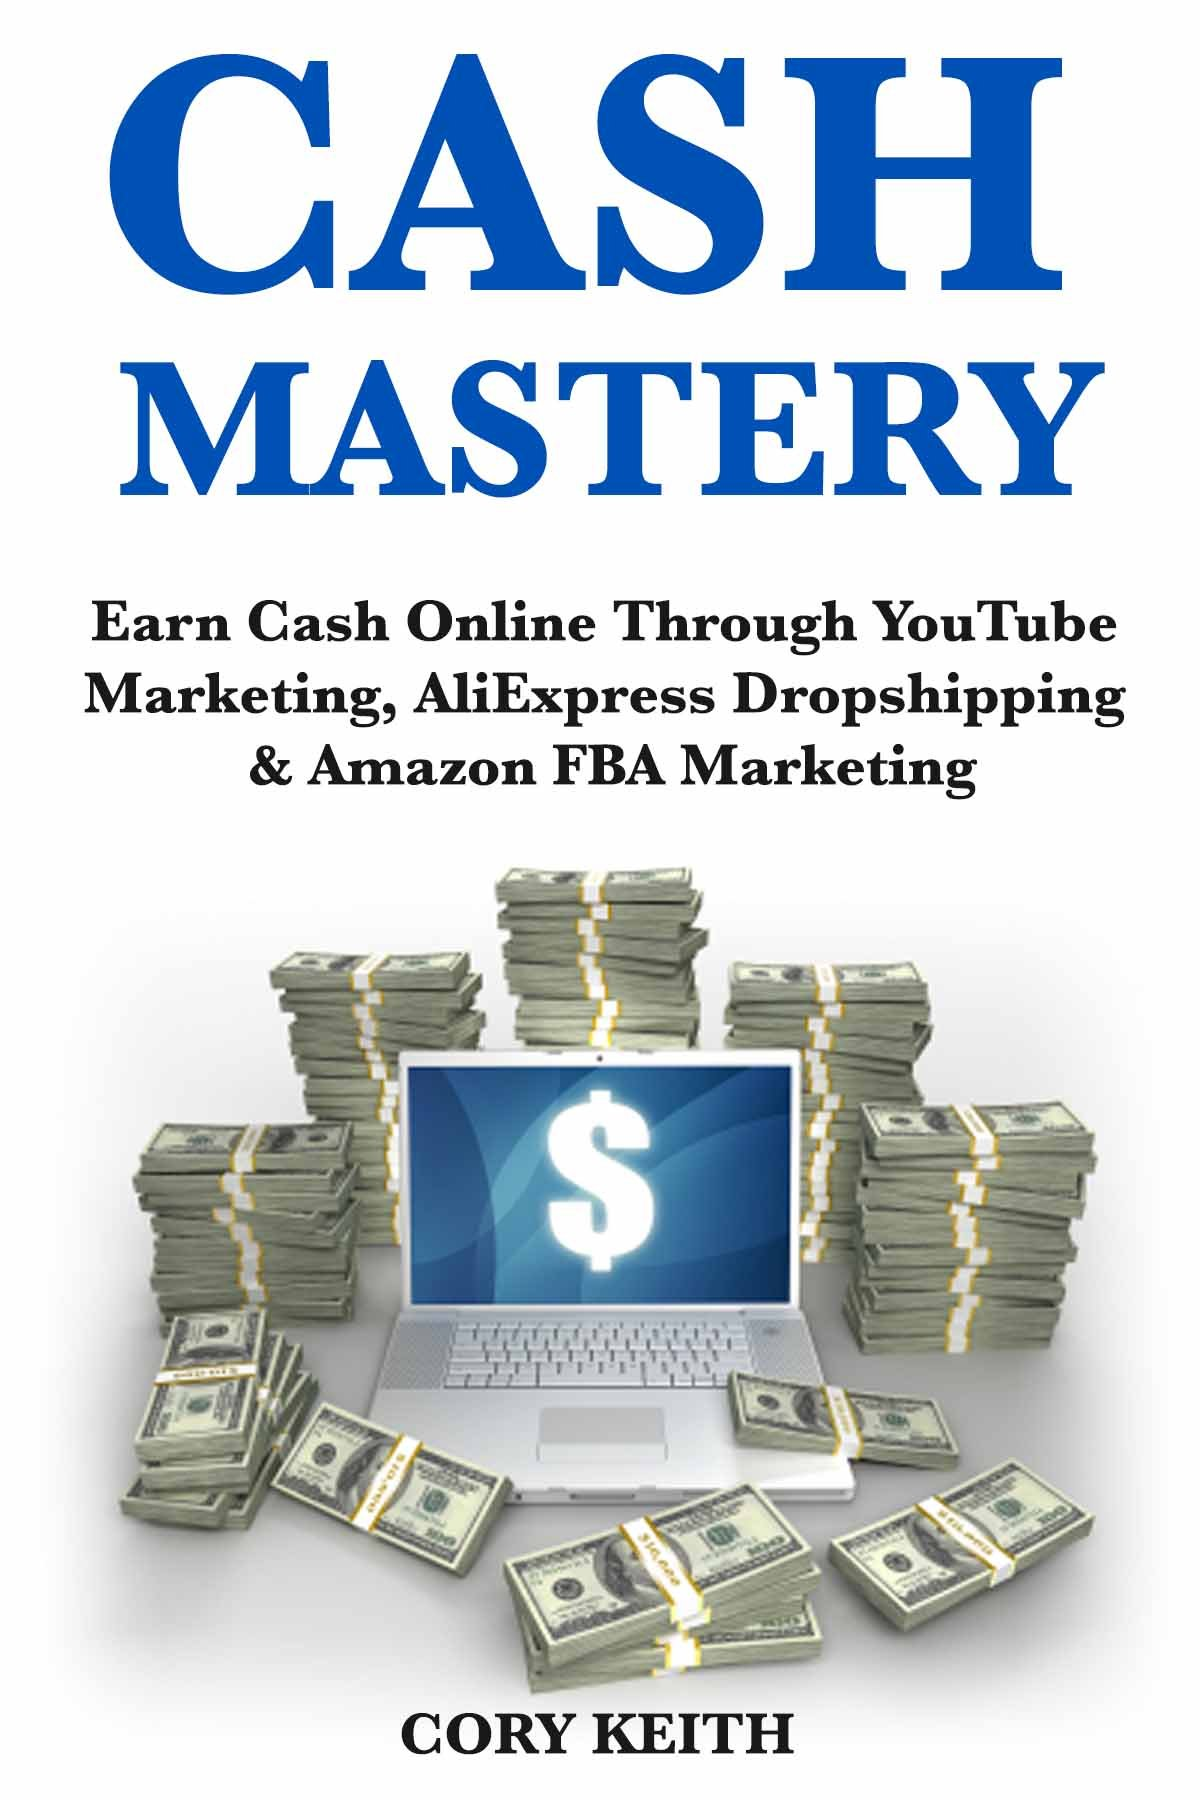 Cash Mastery: Earn Cash Online Through YouTube Marketing, AliExpress Dropshipping & Amazon FBA Marketing